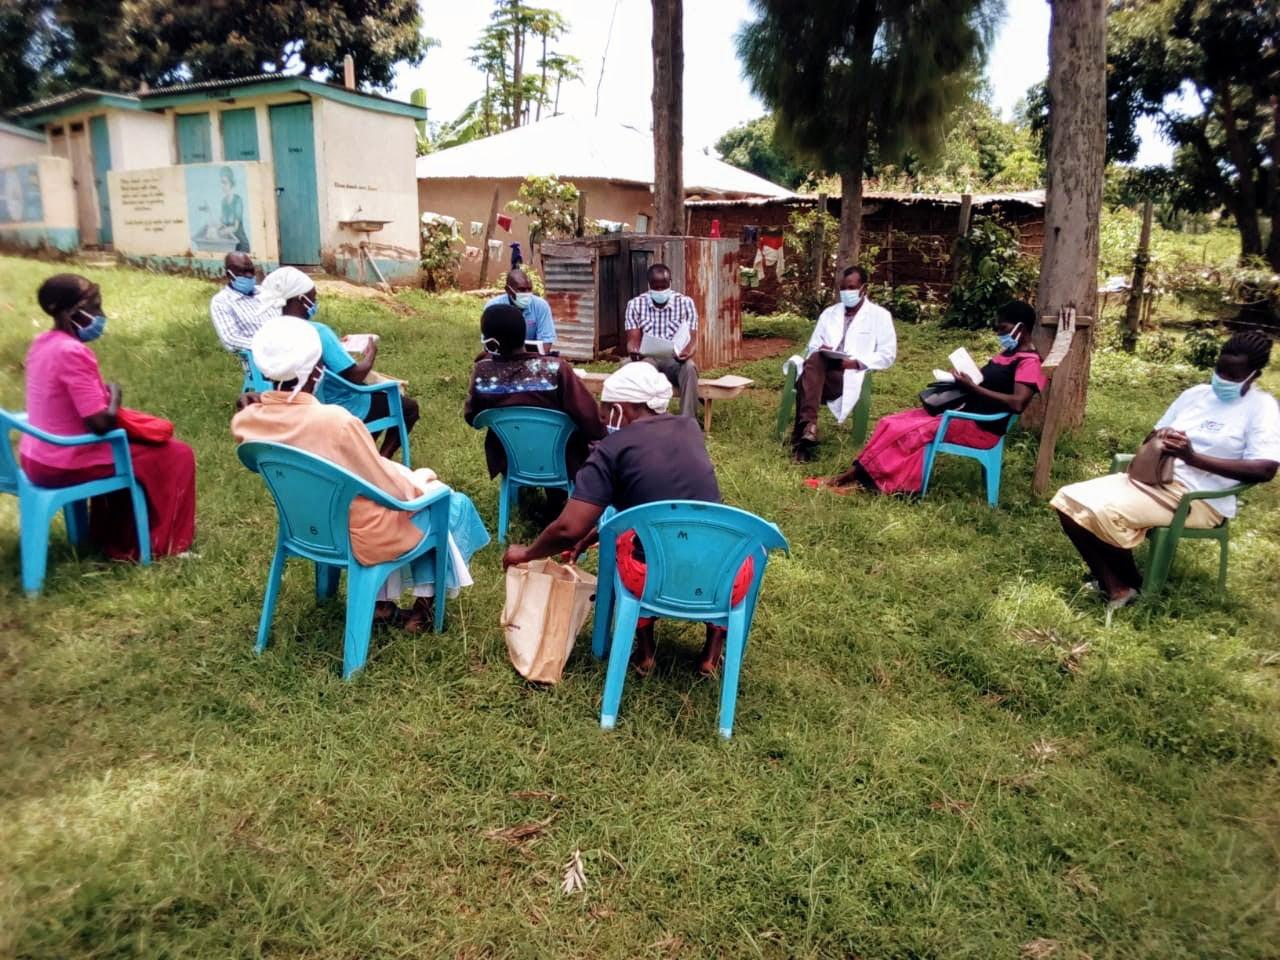 Milton conducts a COVID-19 sensitization meeting in his community. Photo courtesy of Milton Okumu Maina for IntraHealth International.